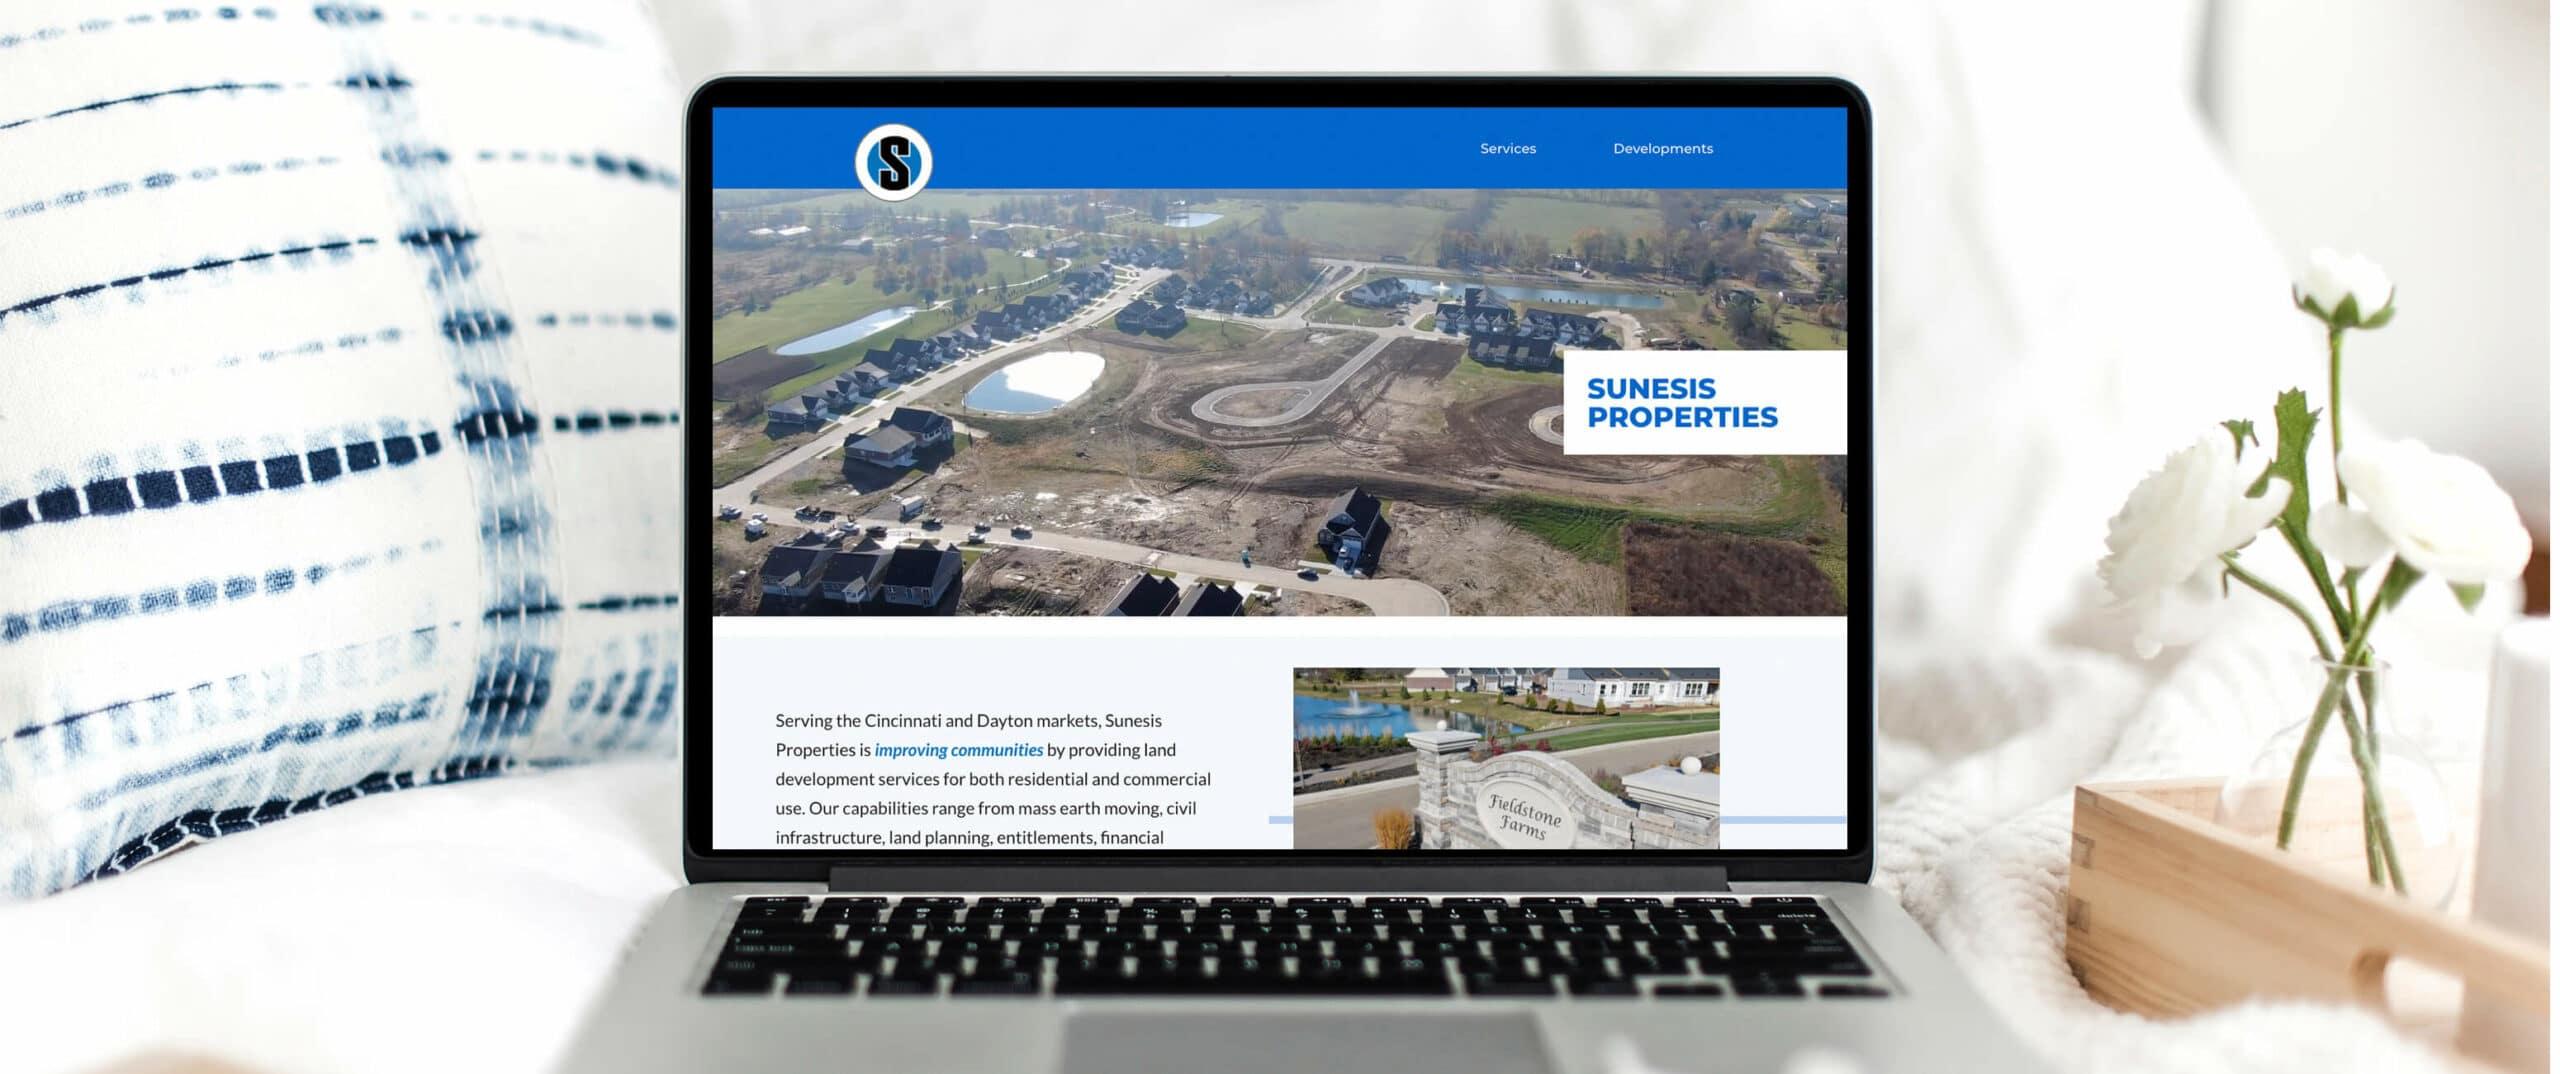 Sunesis Properties of Cincinnati, Ohio Header Image